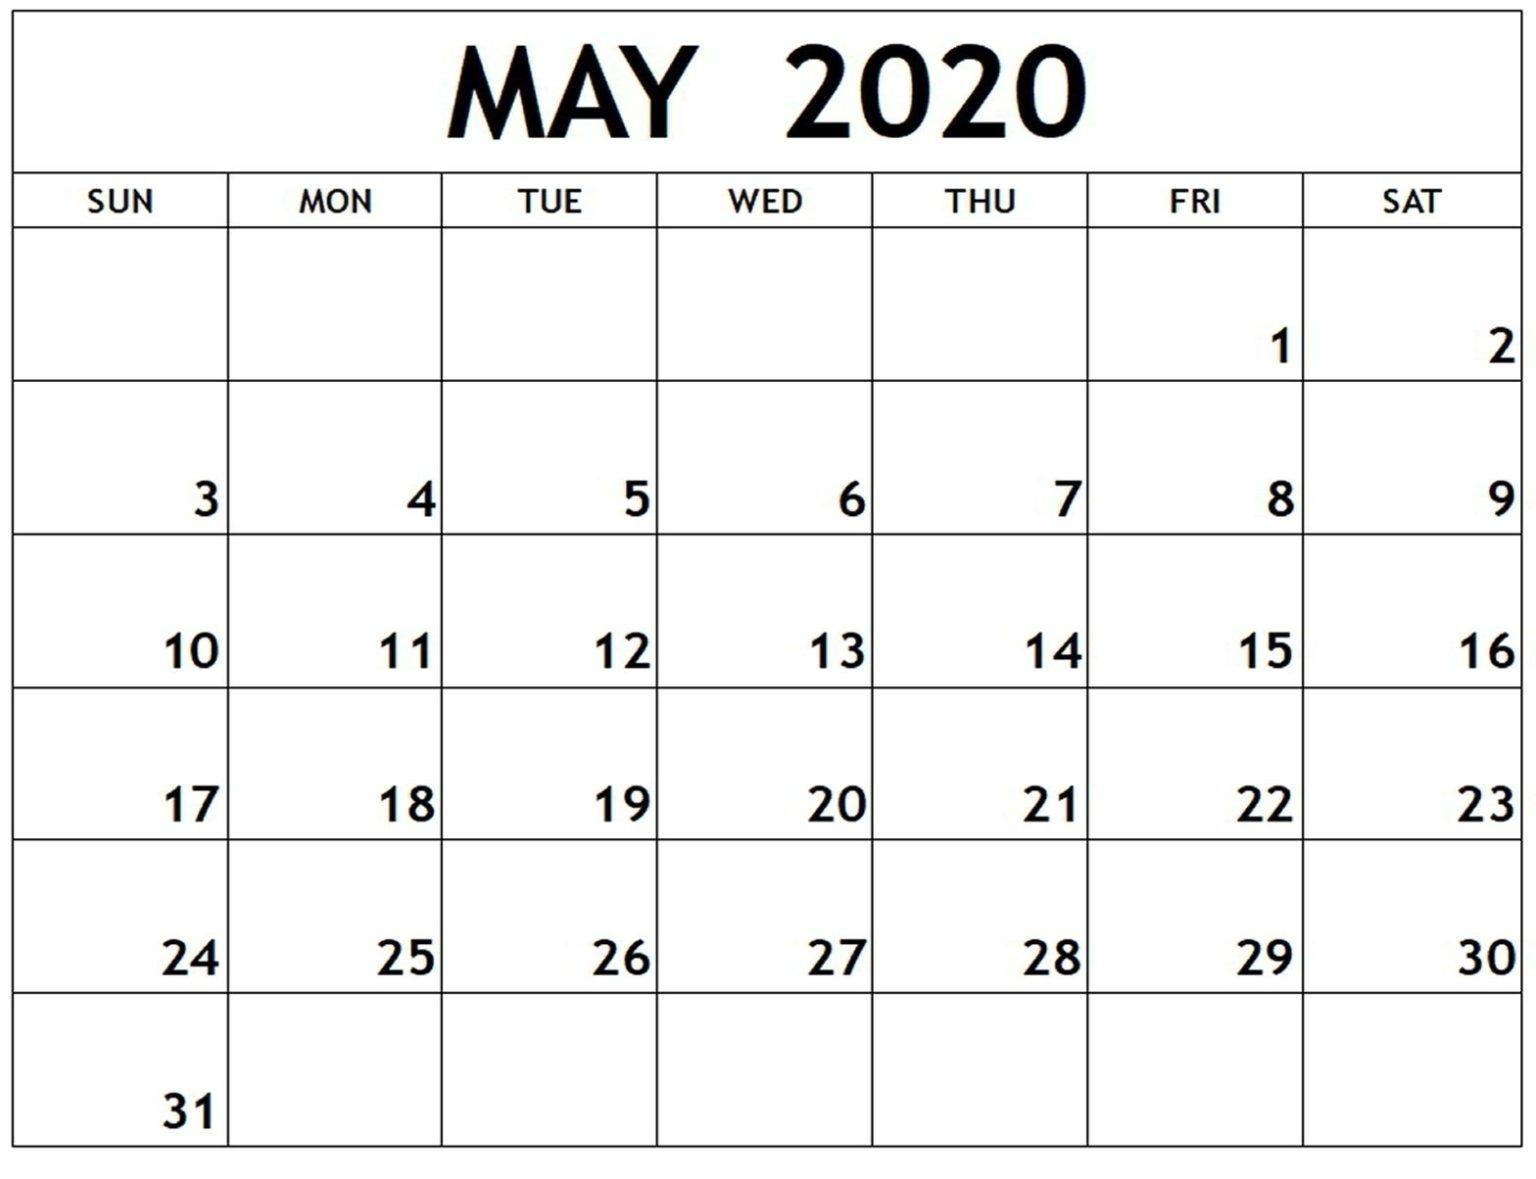 Free Printable Calendar May 2020 Download | Free Printable